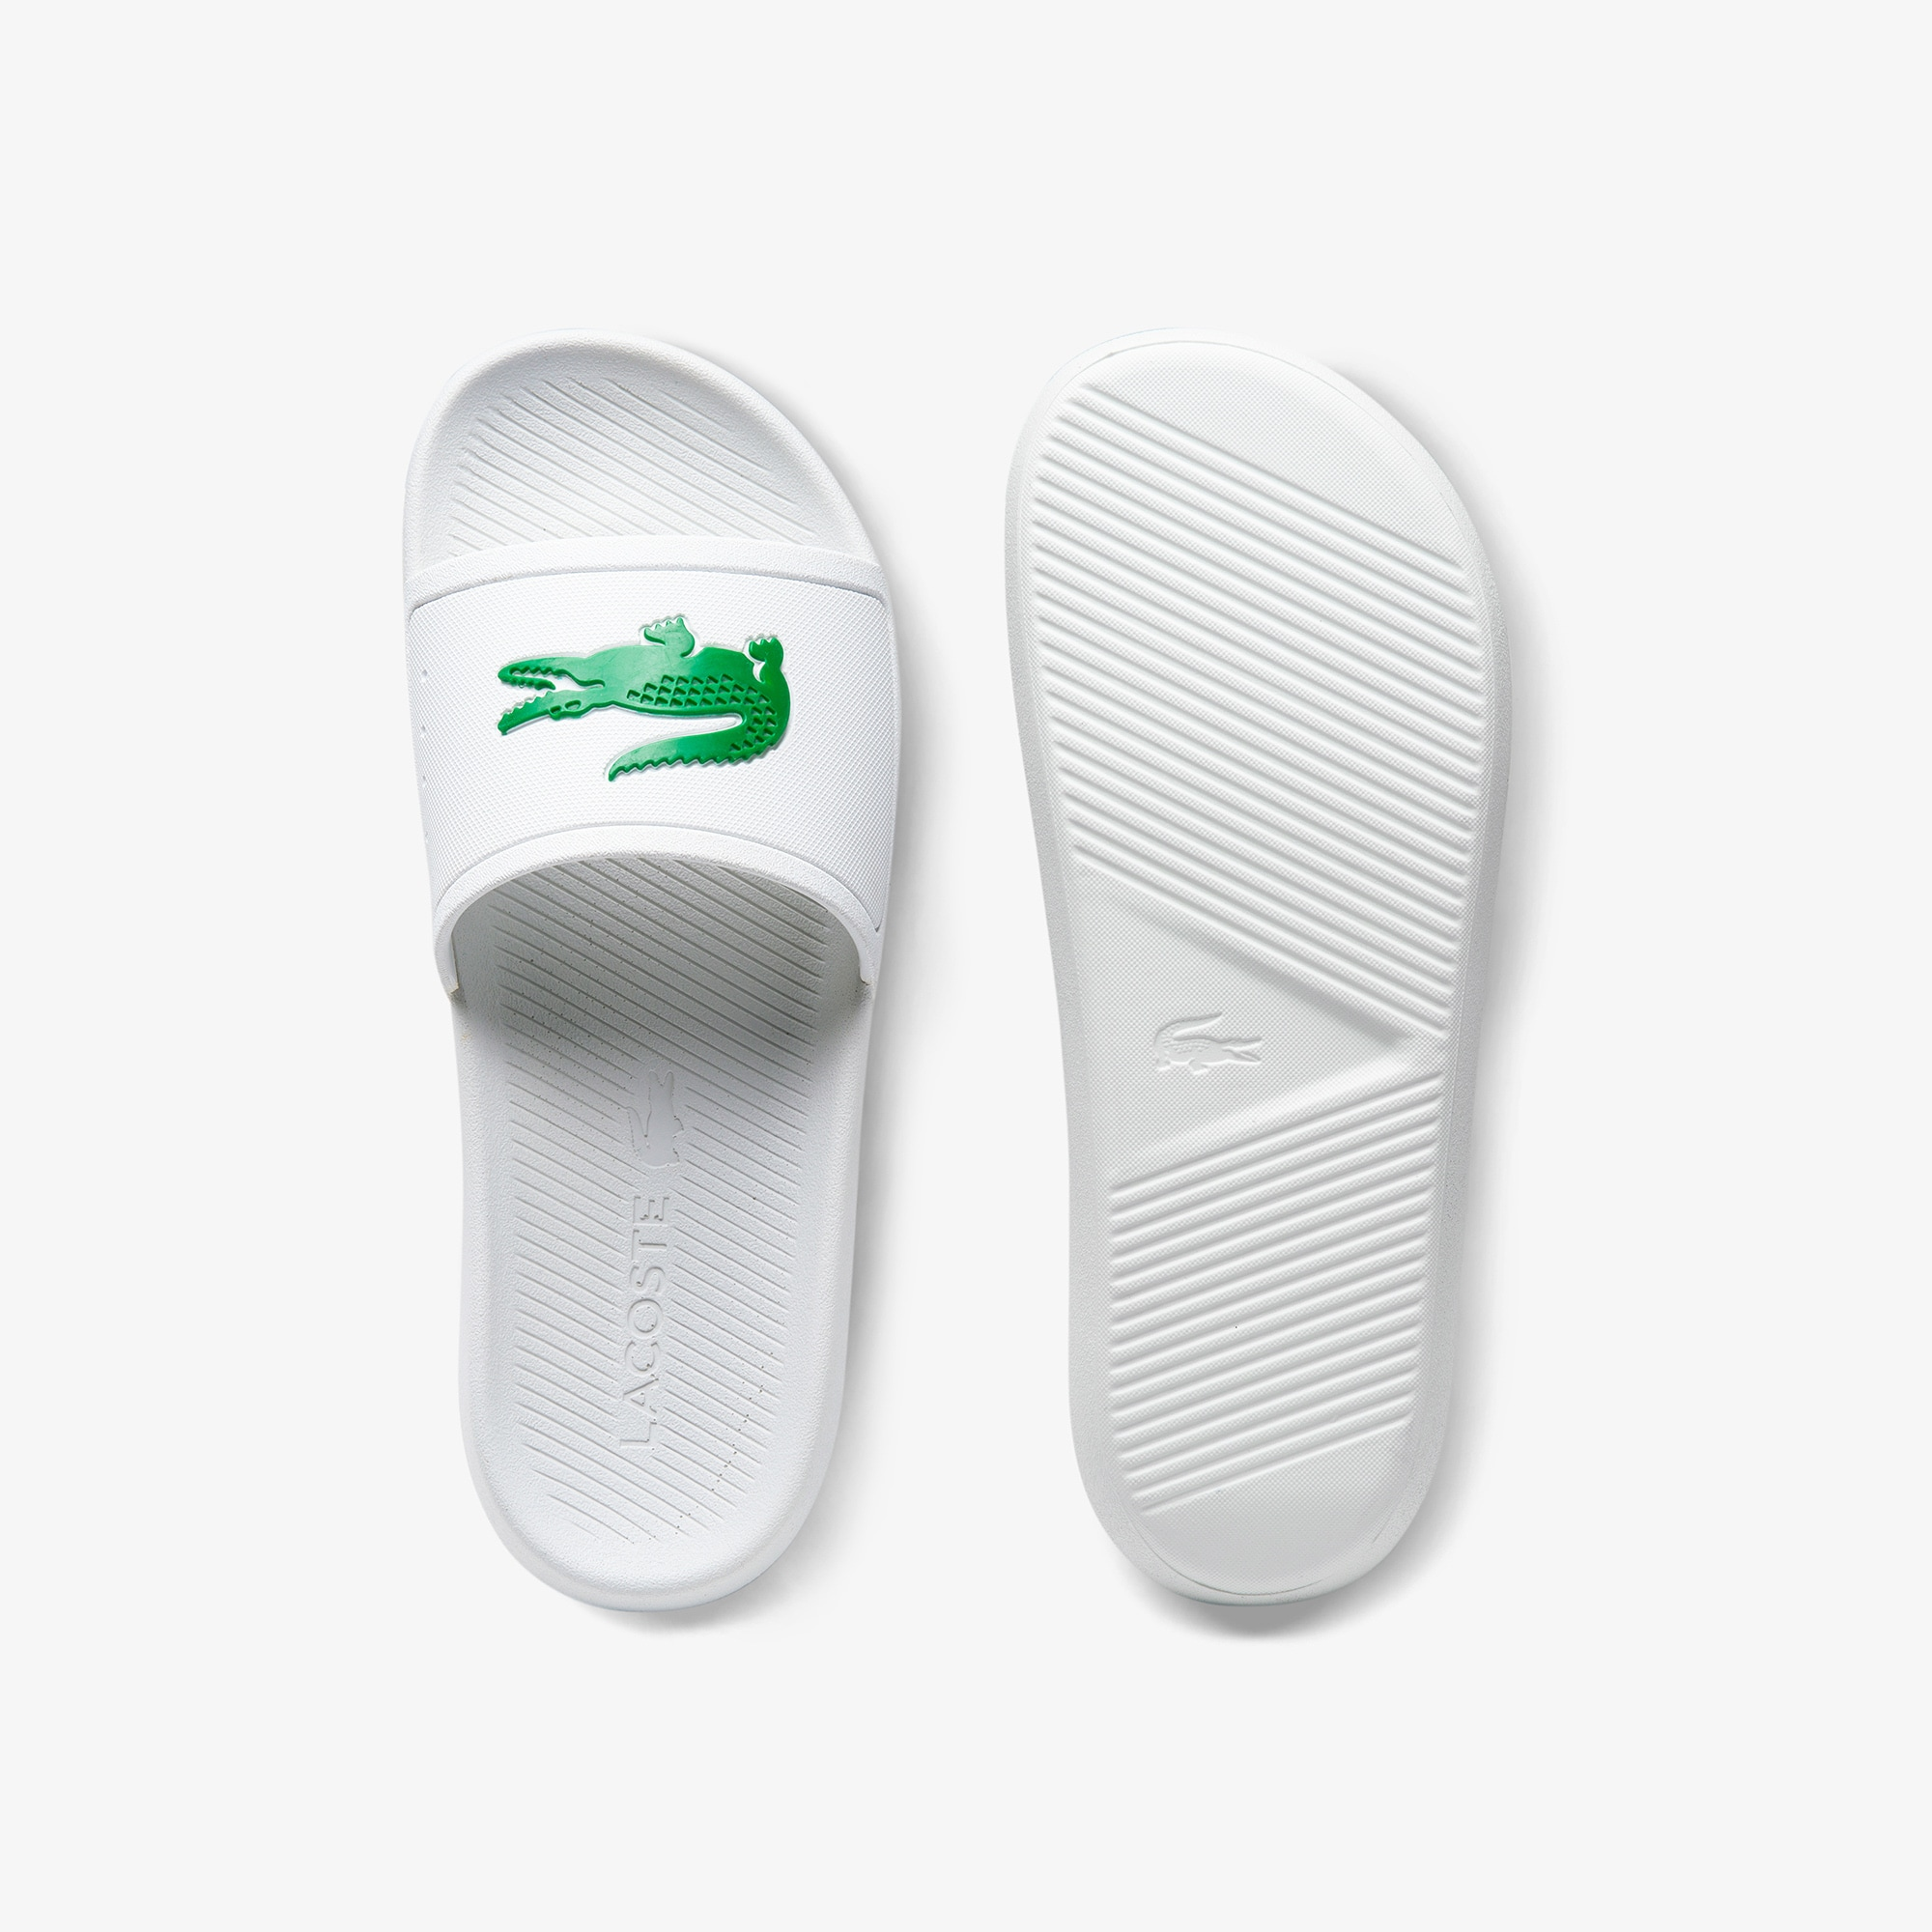 ed4c18682 Women s Croco Rubber Slides